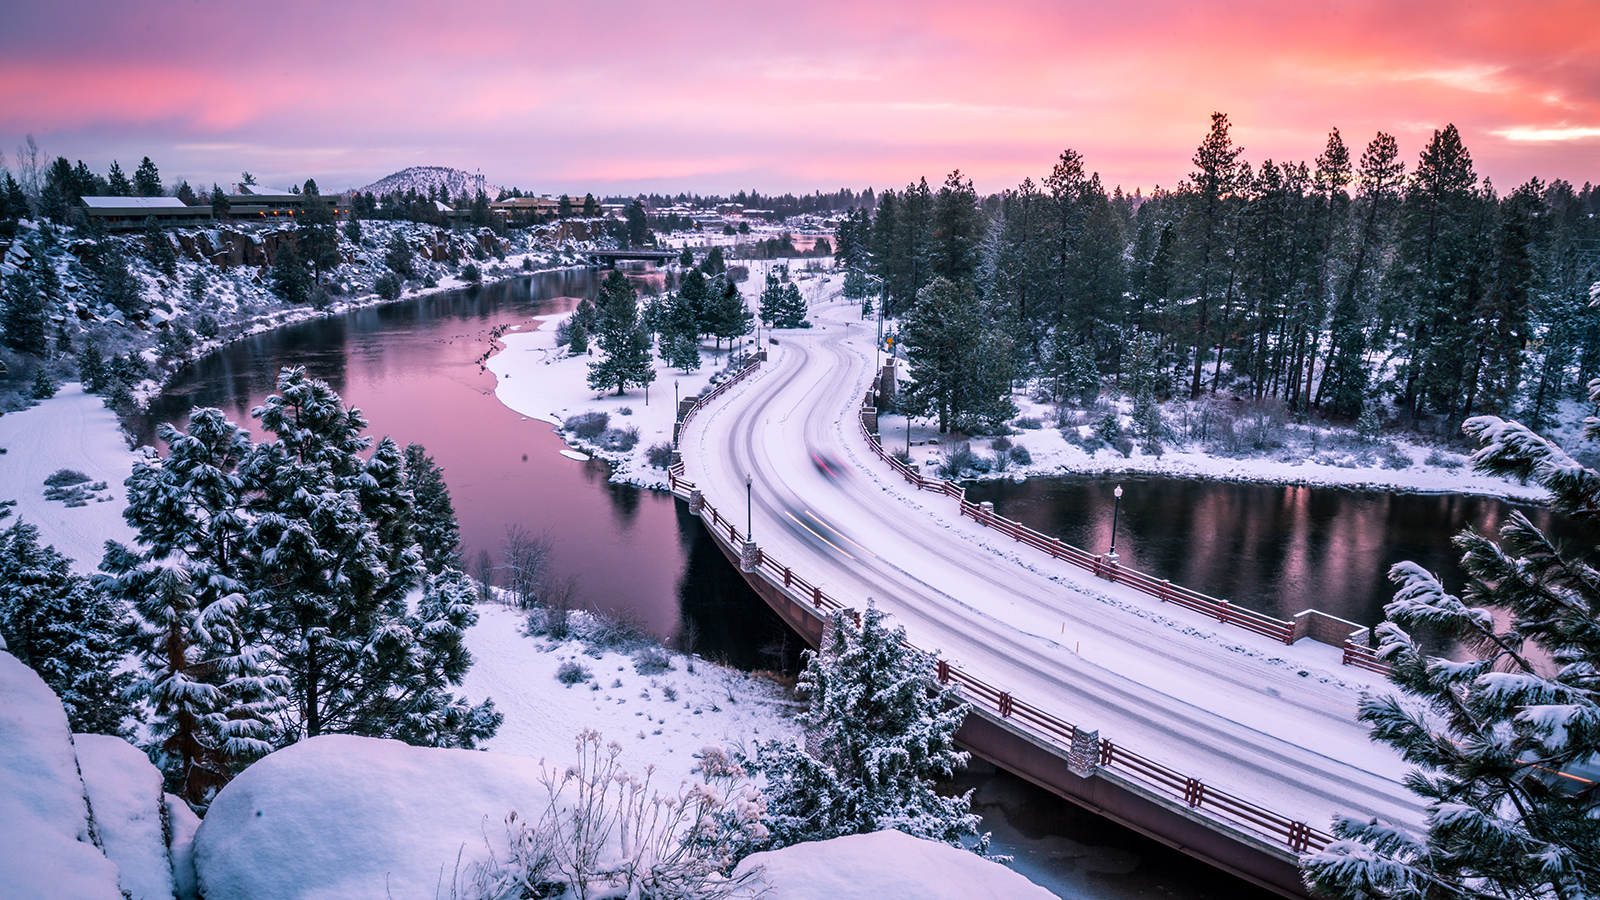 Ultimate Winter Getaway to Bend